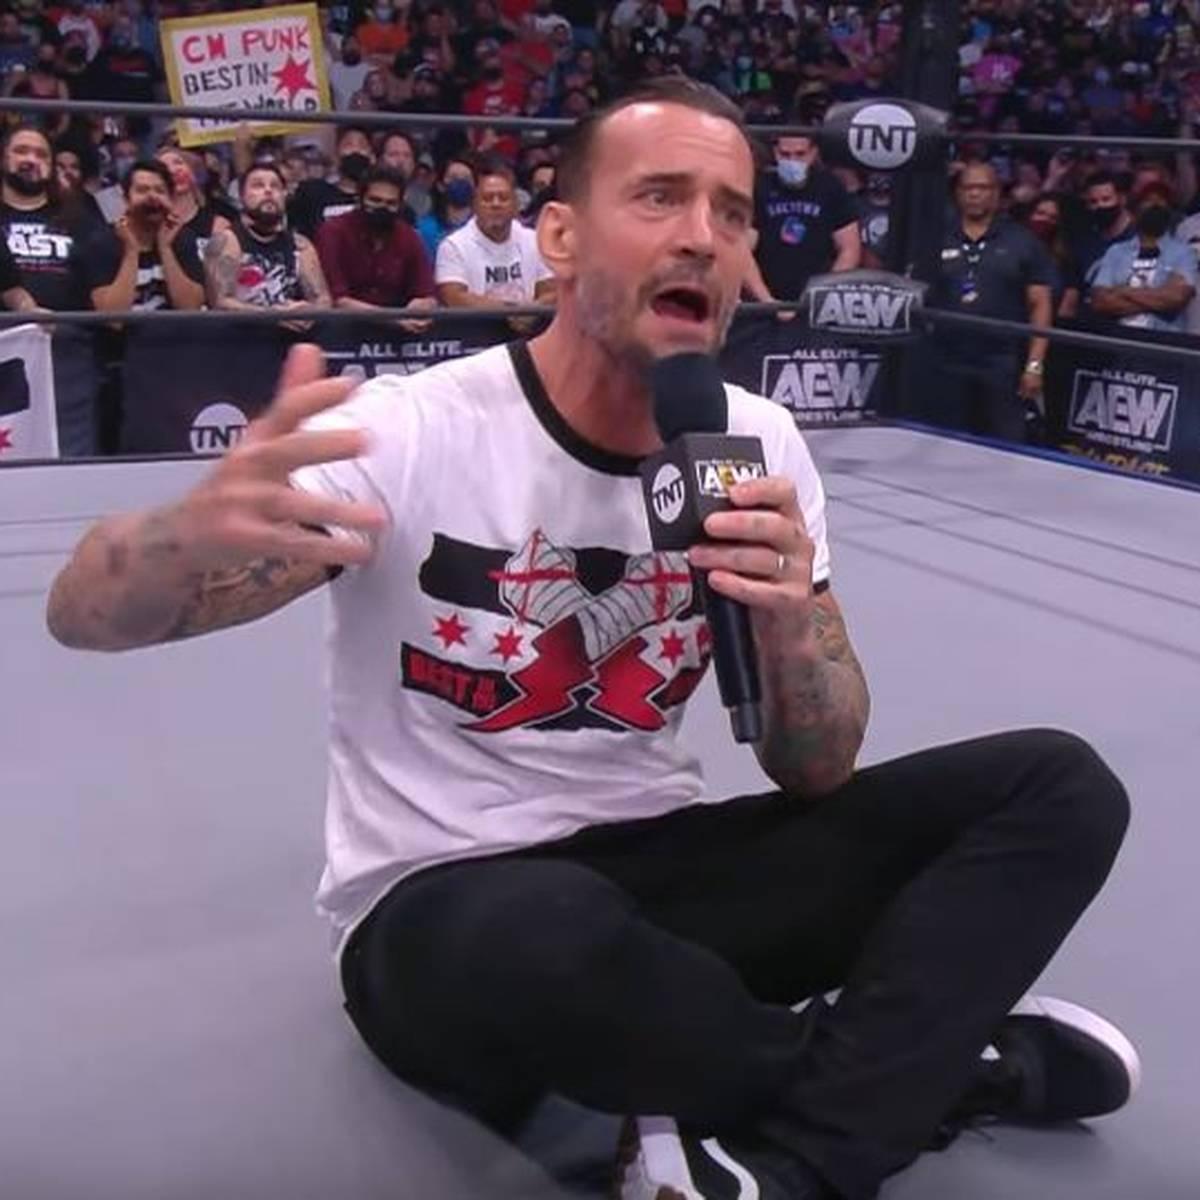 Mit Hieben gegen WWE: CM Punks komplette Comeback-Rede